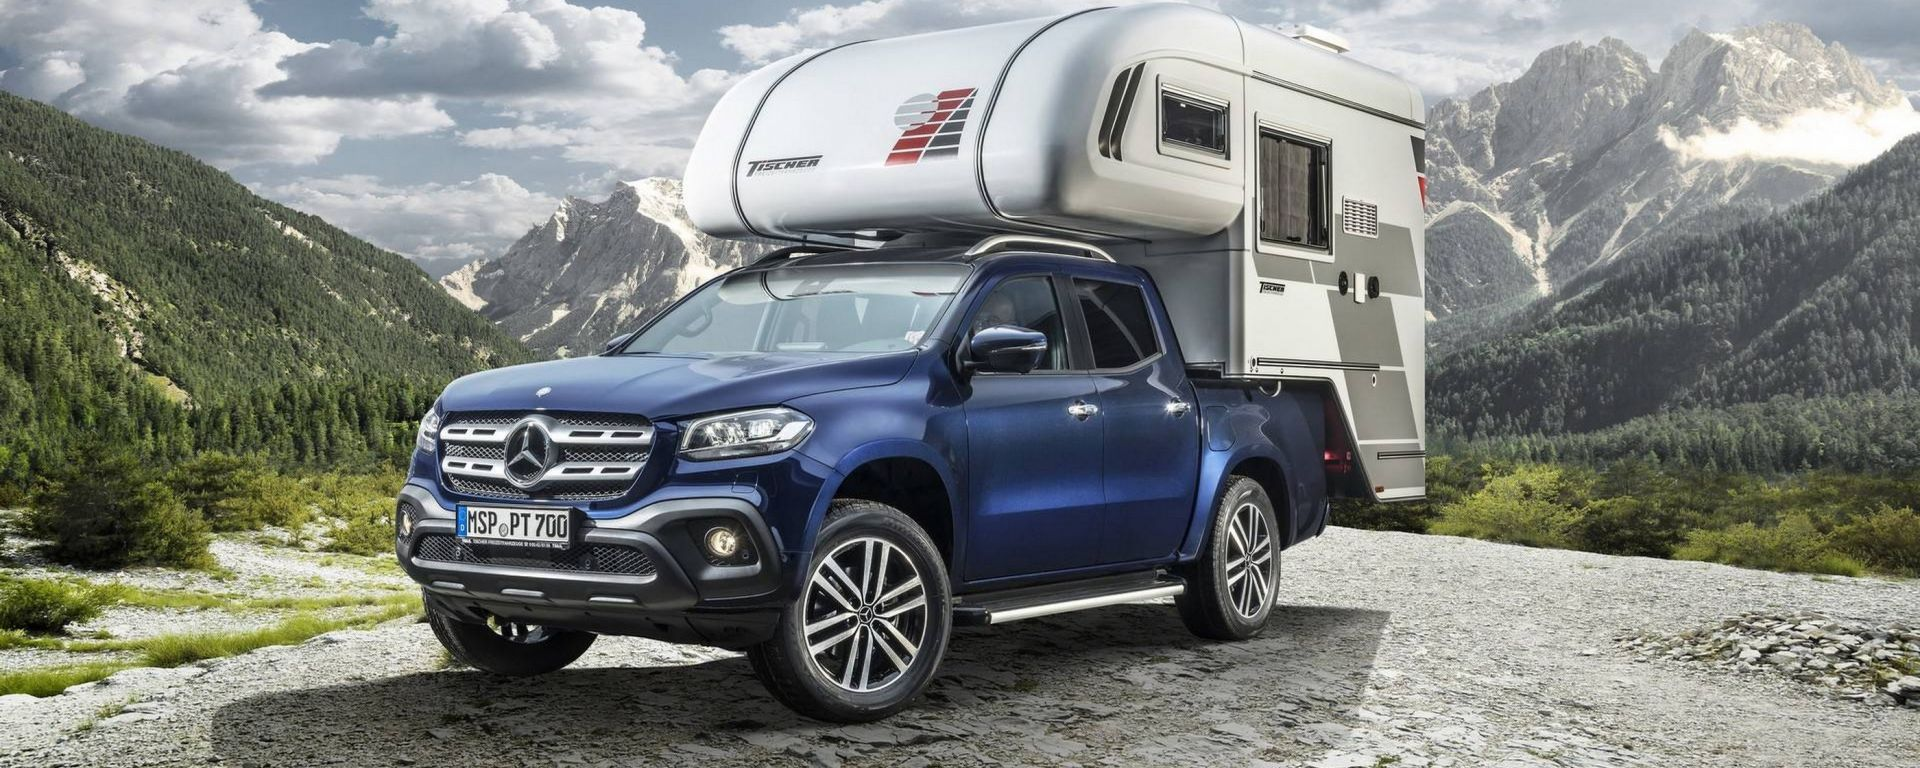 Mercedes Classe X: quando il pick-up diventa camper. Ecco ...